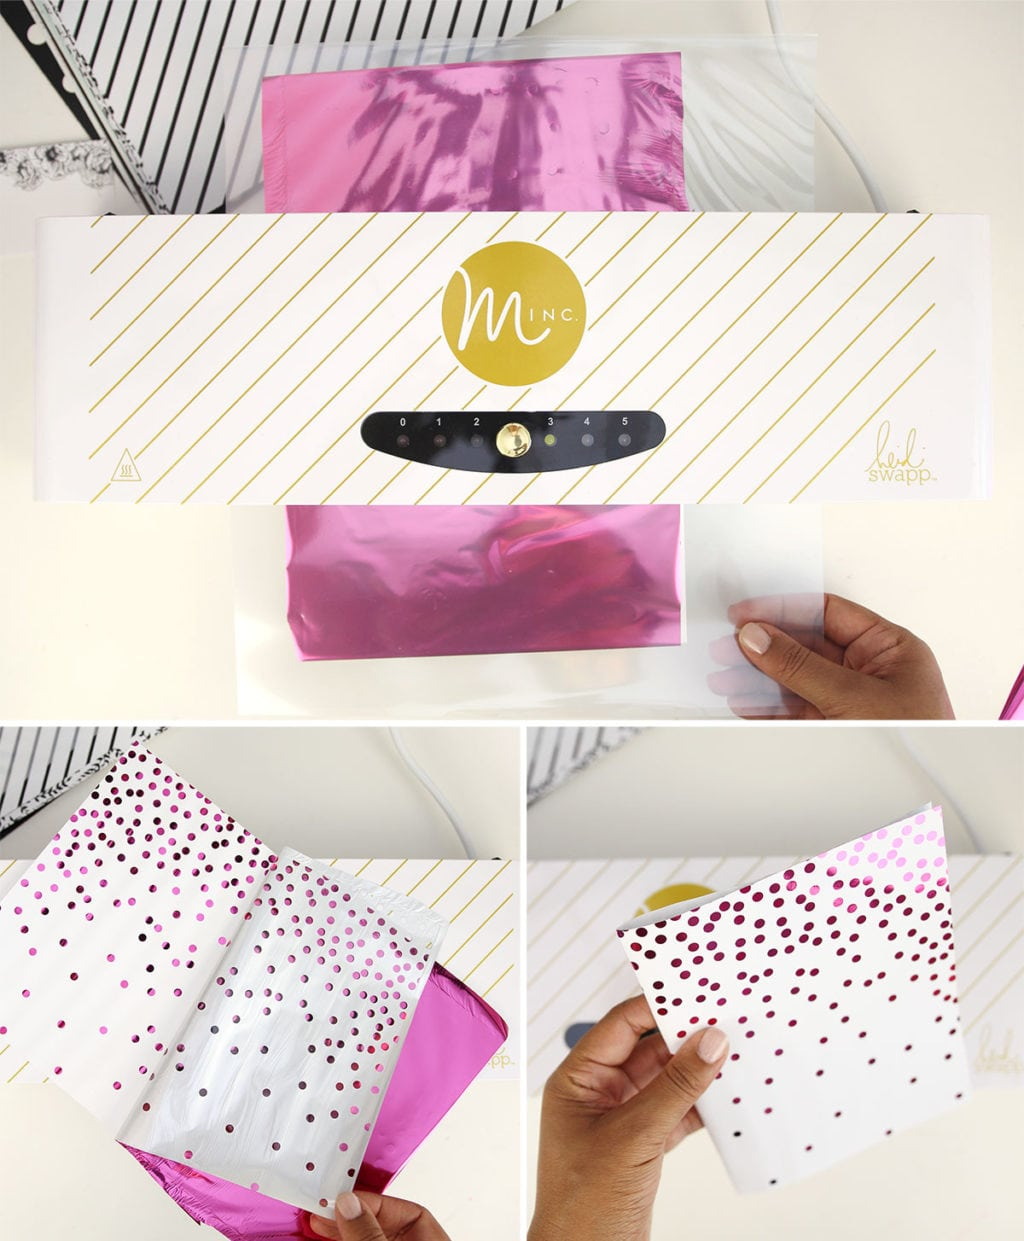 Minc Foiled Notebooks Step 2